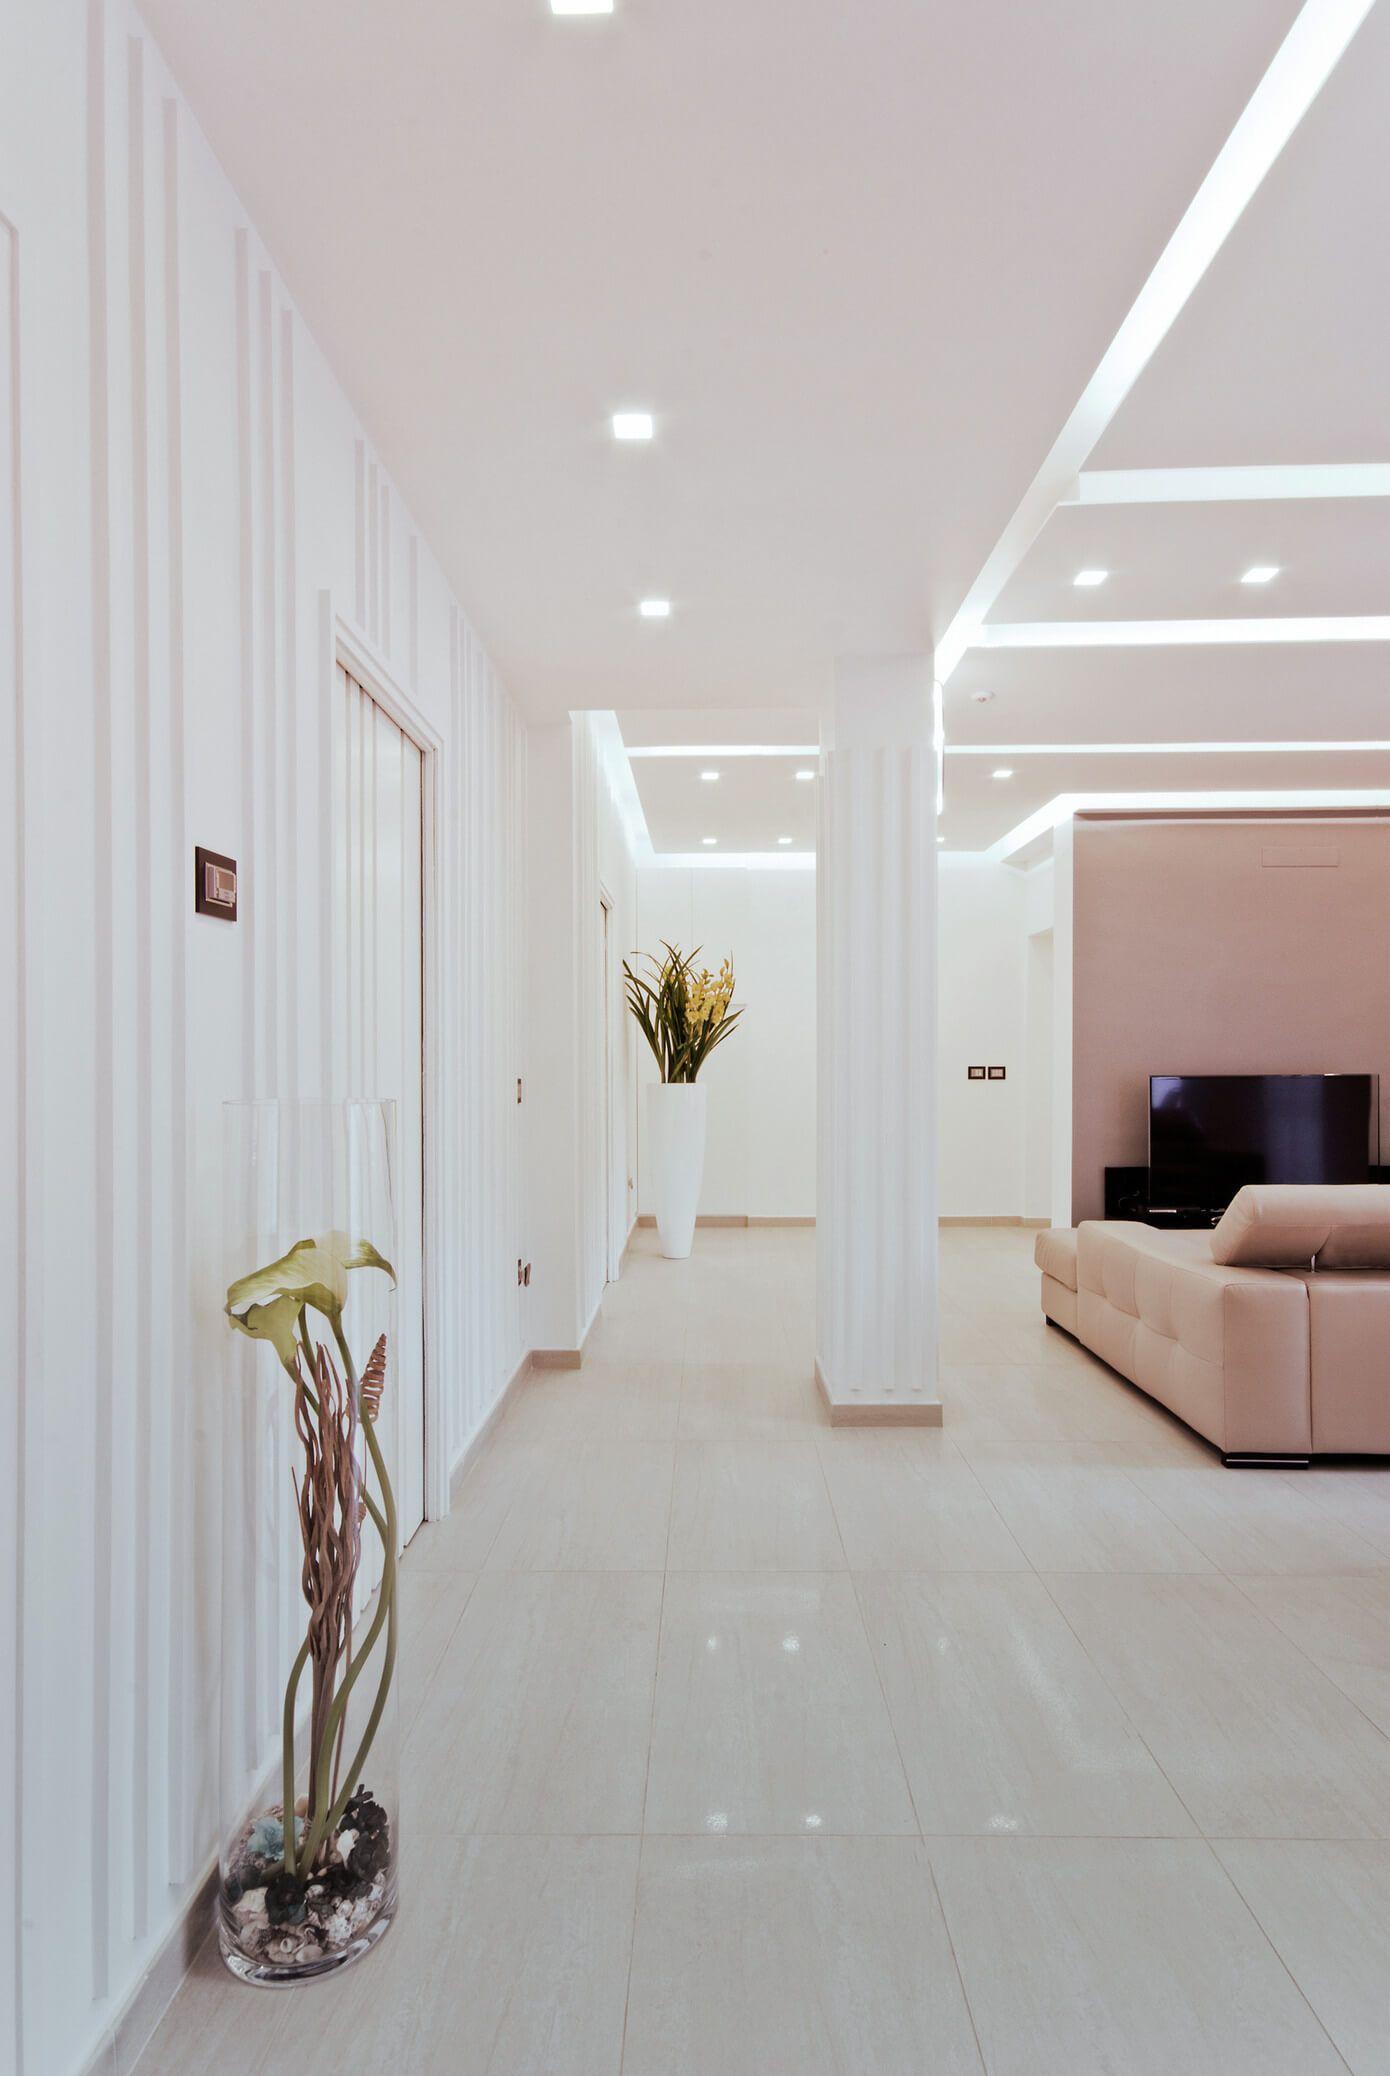 Interior-I--by-b2c-architects-04